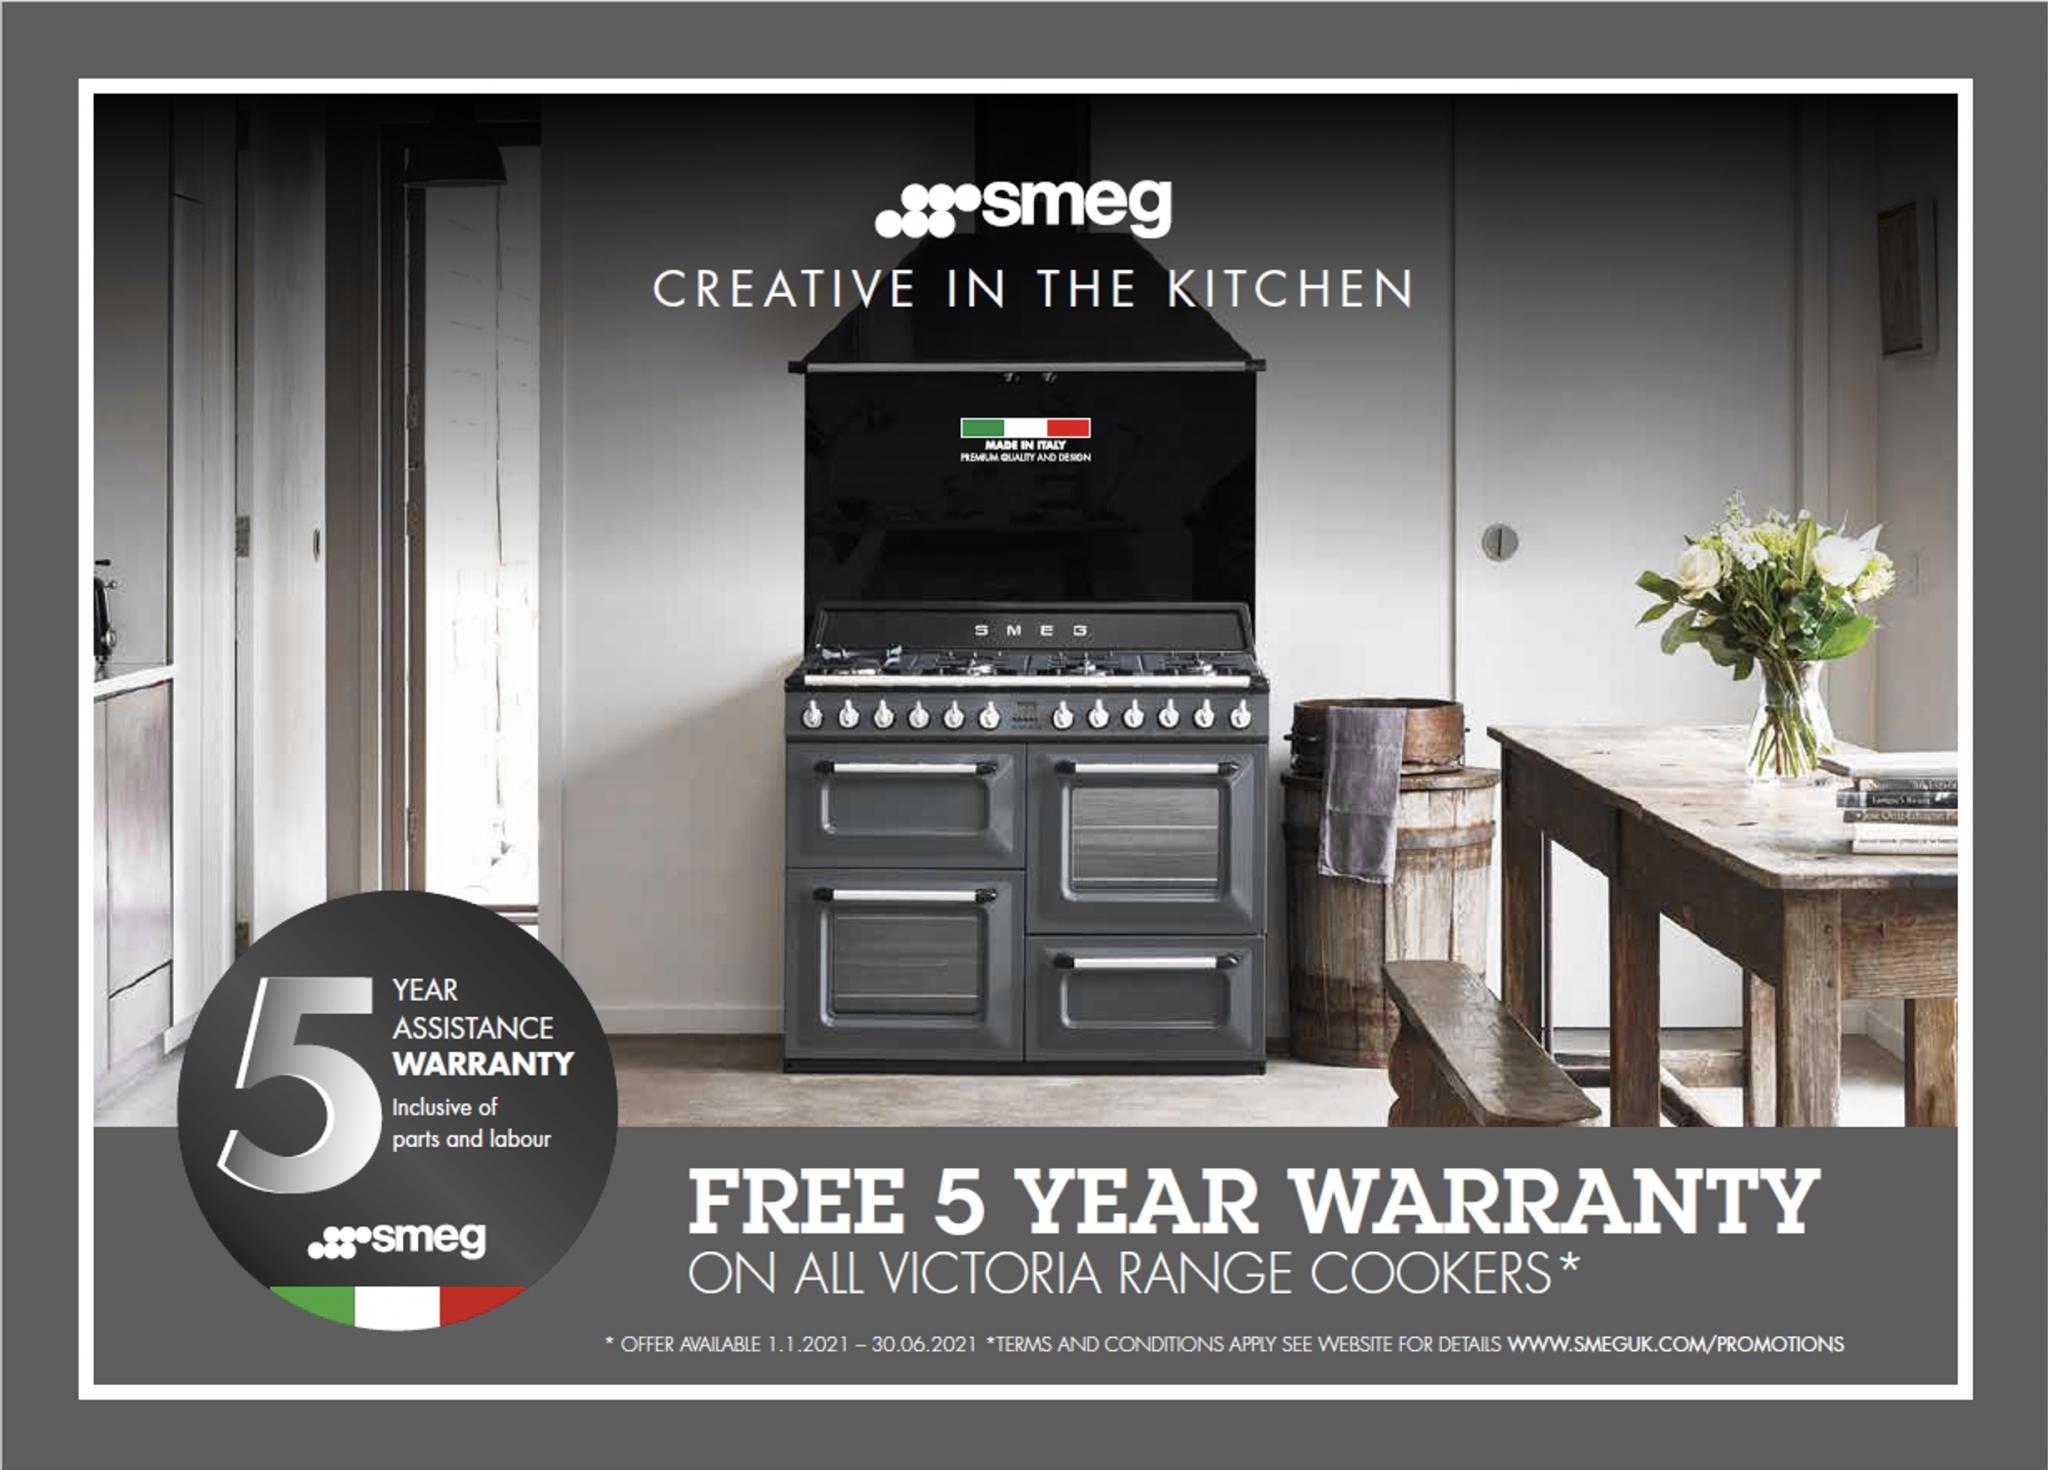 Free 5 year guarantee on selected Smeg range cookers